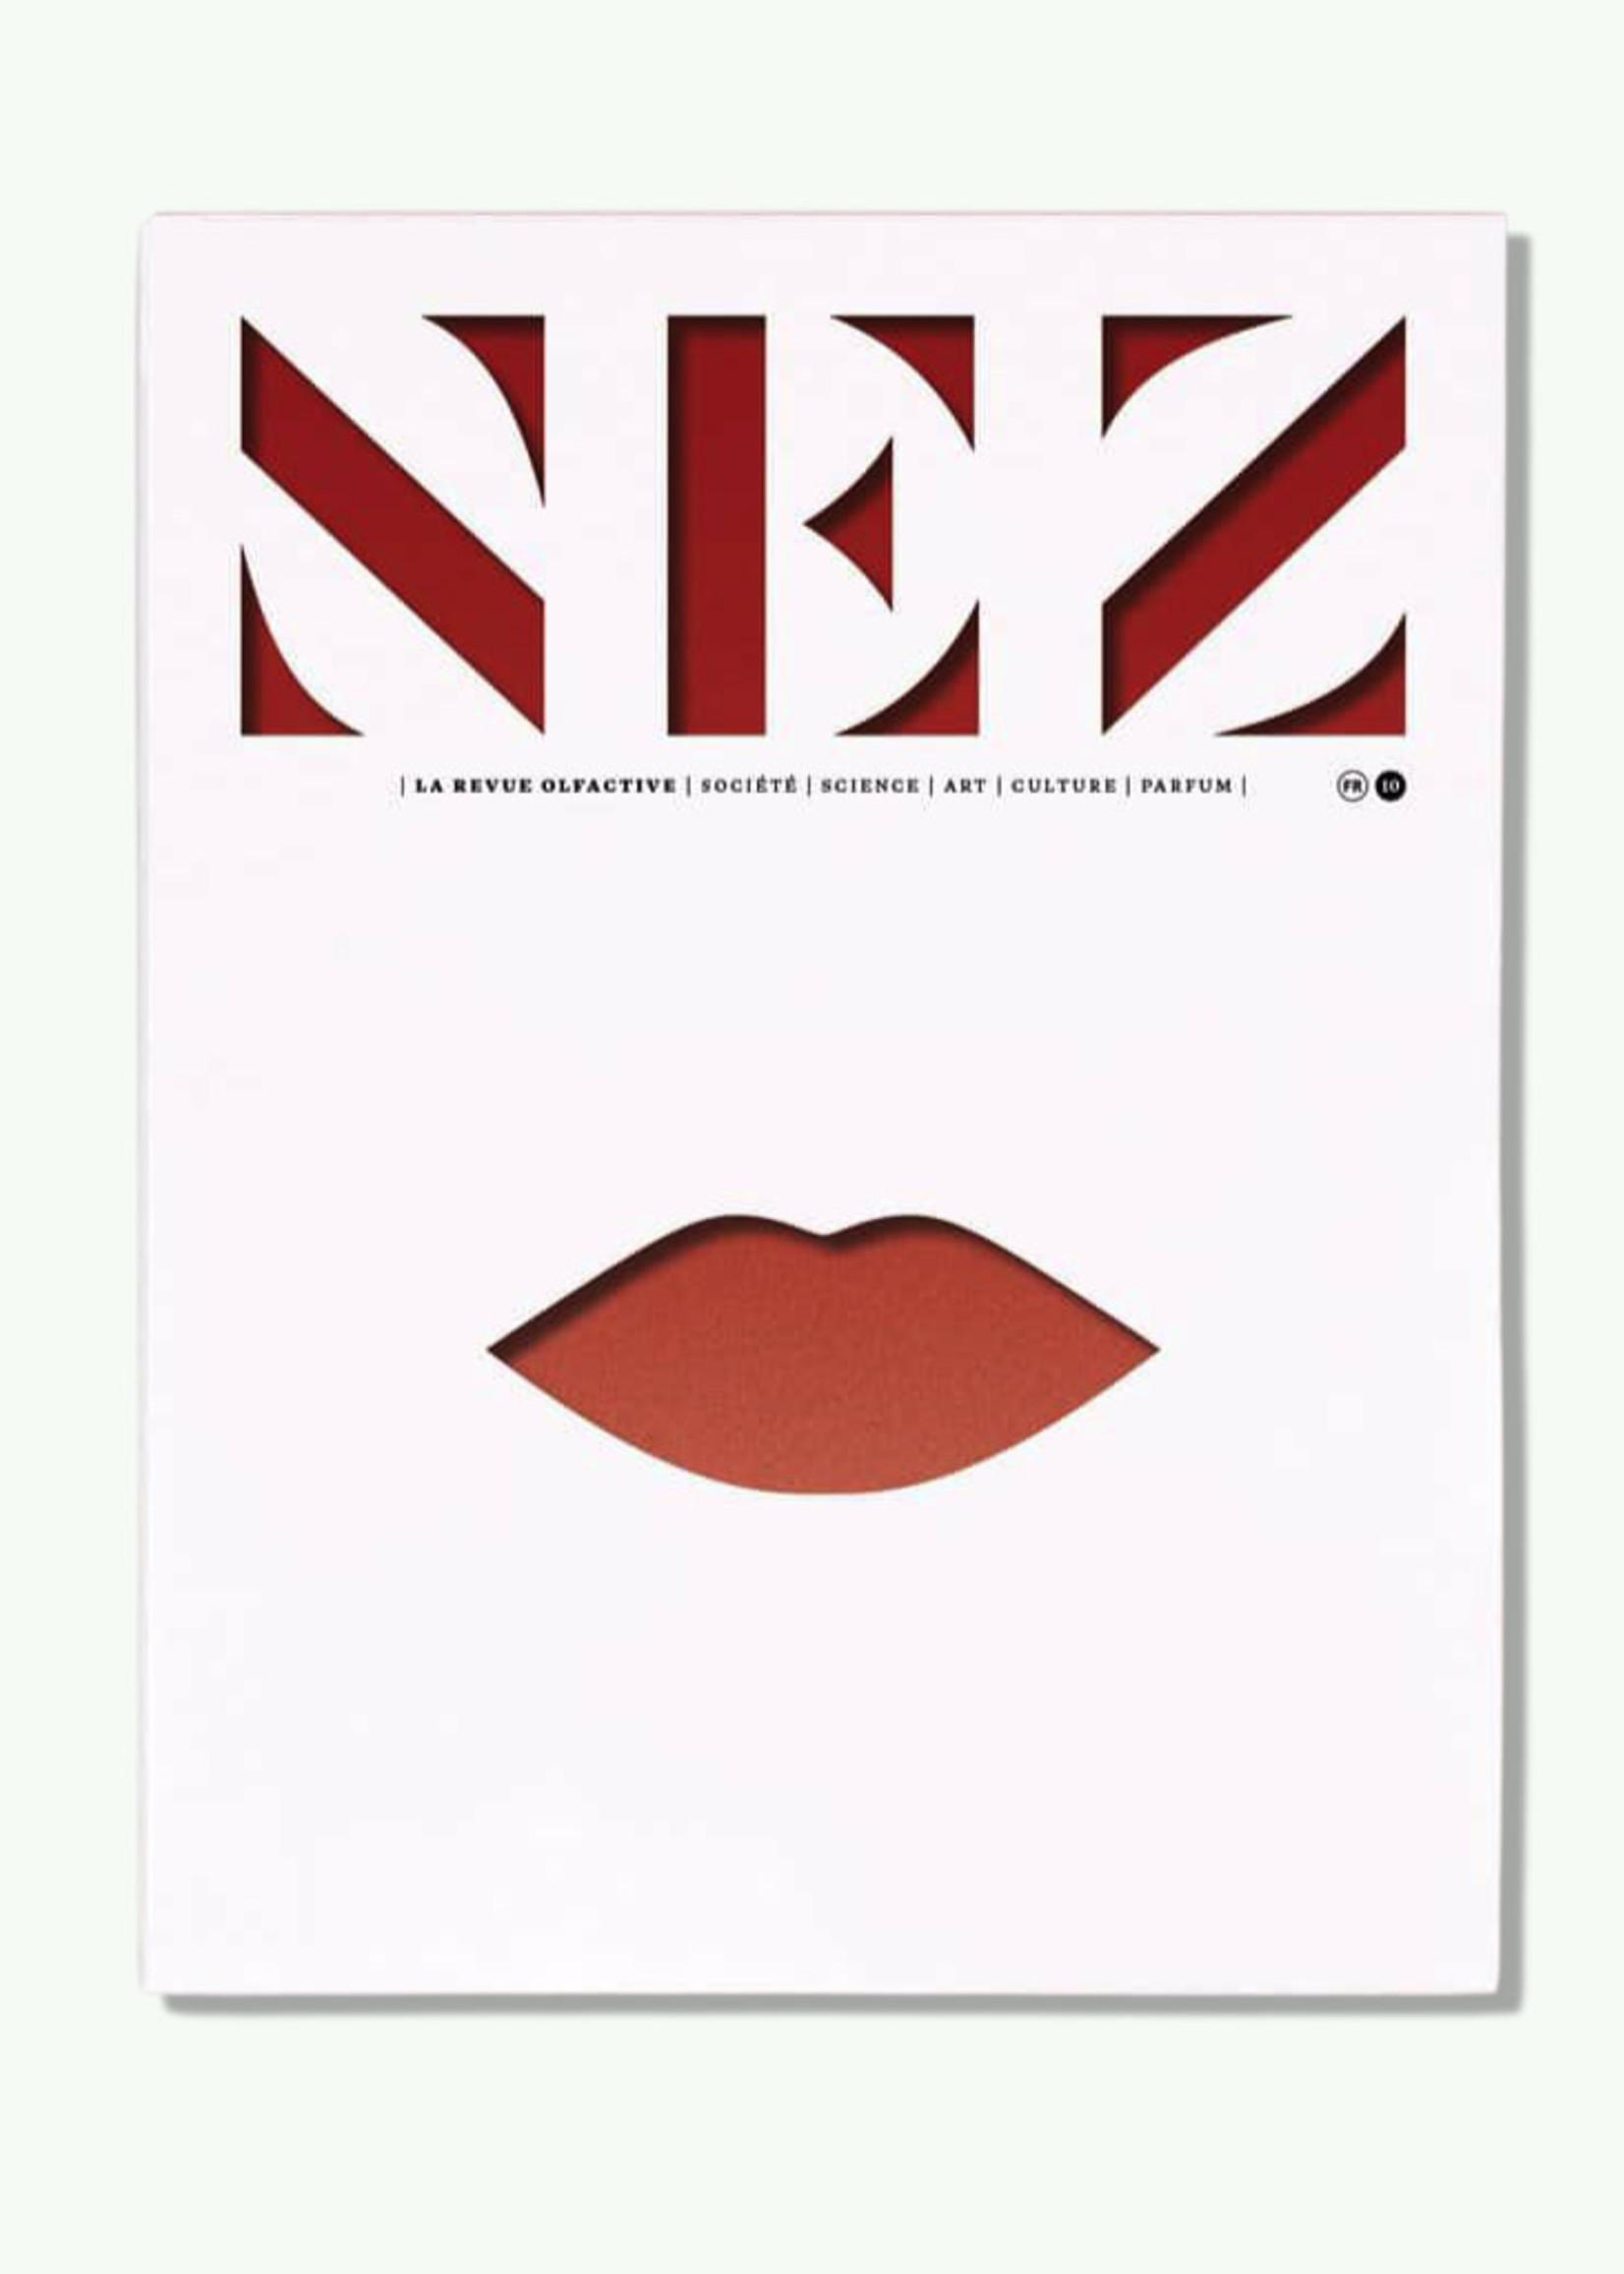 NEZ n°10 - The Olfactory Magazine